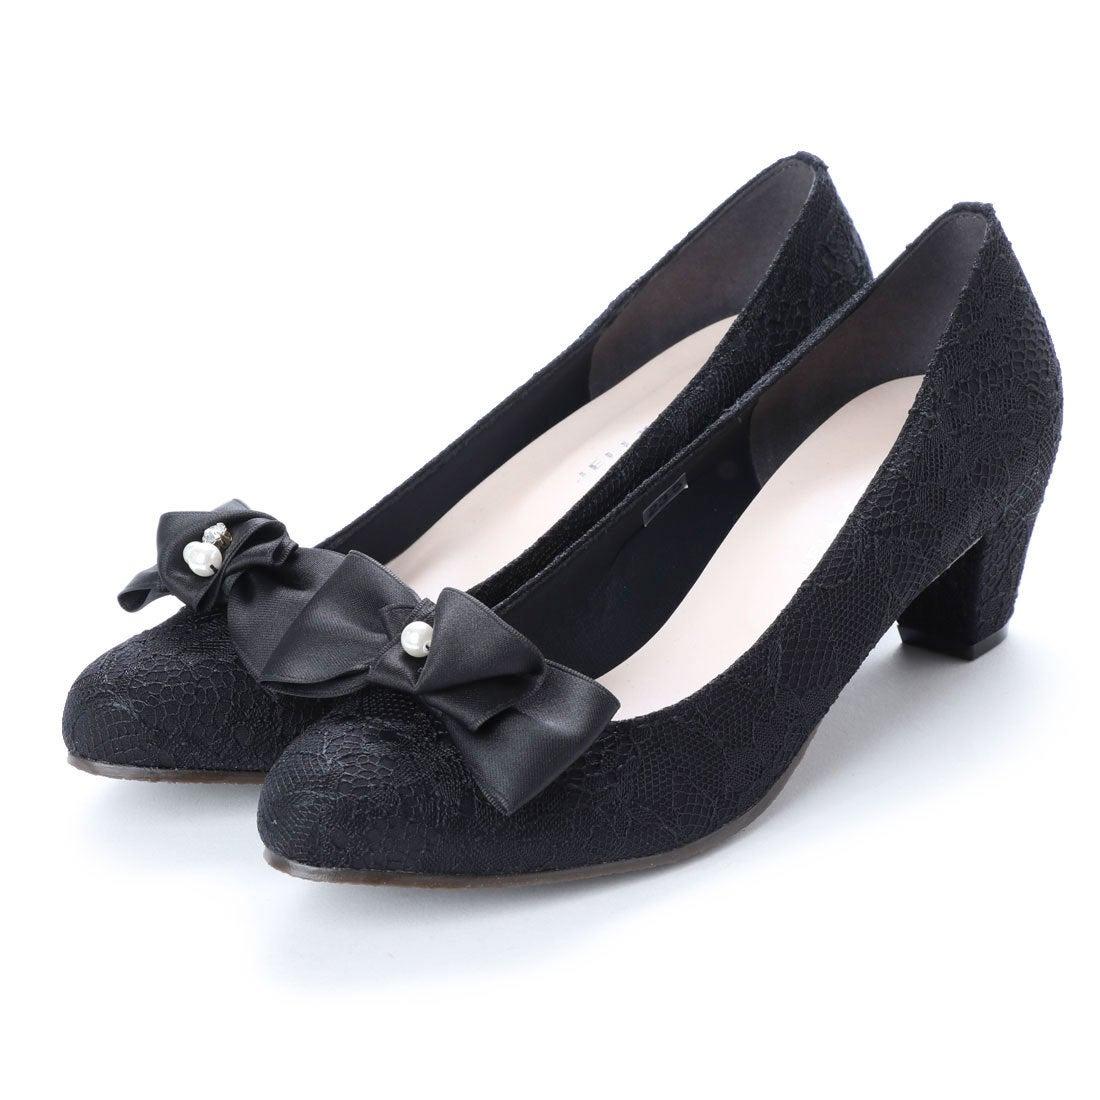 cf8e8a5d2a1e3 ジェリービーンズ JELLY BEANS 2wayパールビジューリボンパンプス 125-5346 (黒レース) -靴&ファッション通販  ロコンド〜自宅で試着、気軽に返品